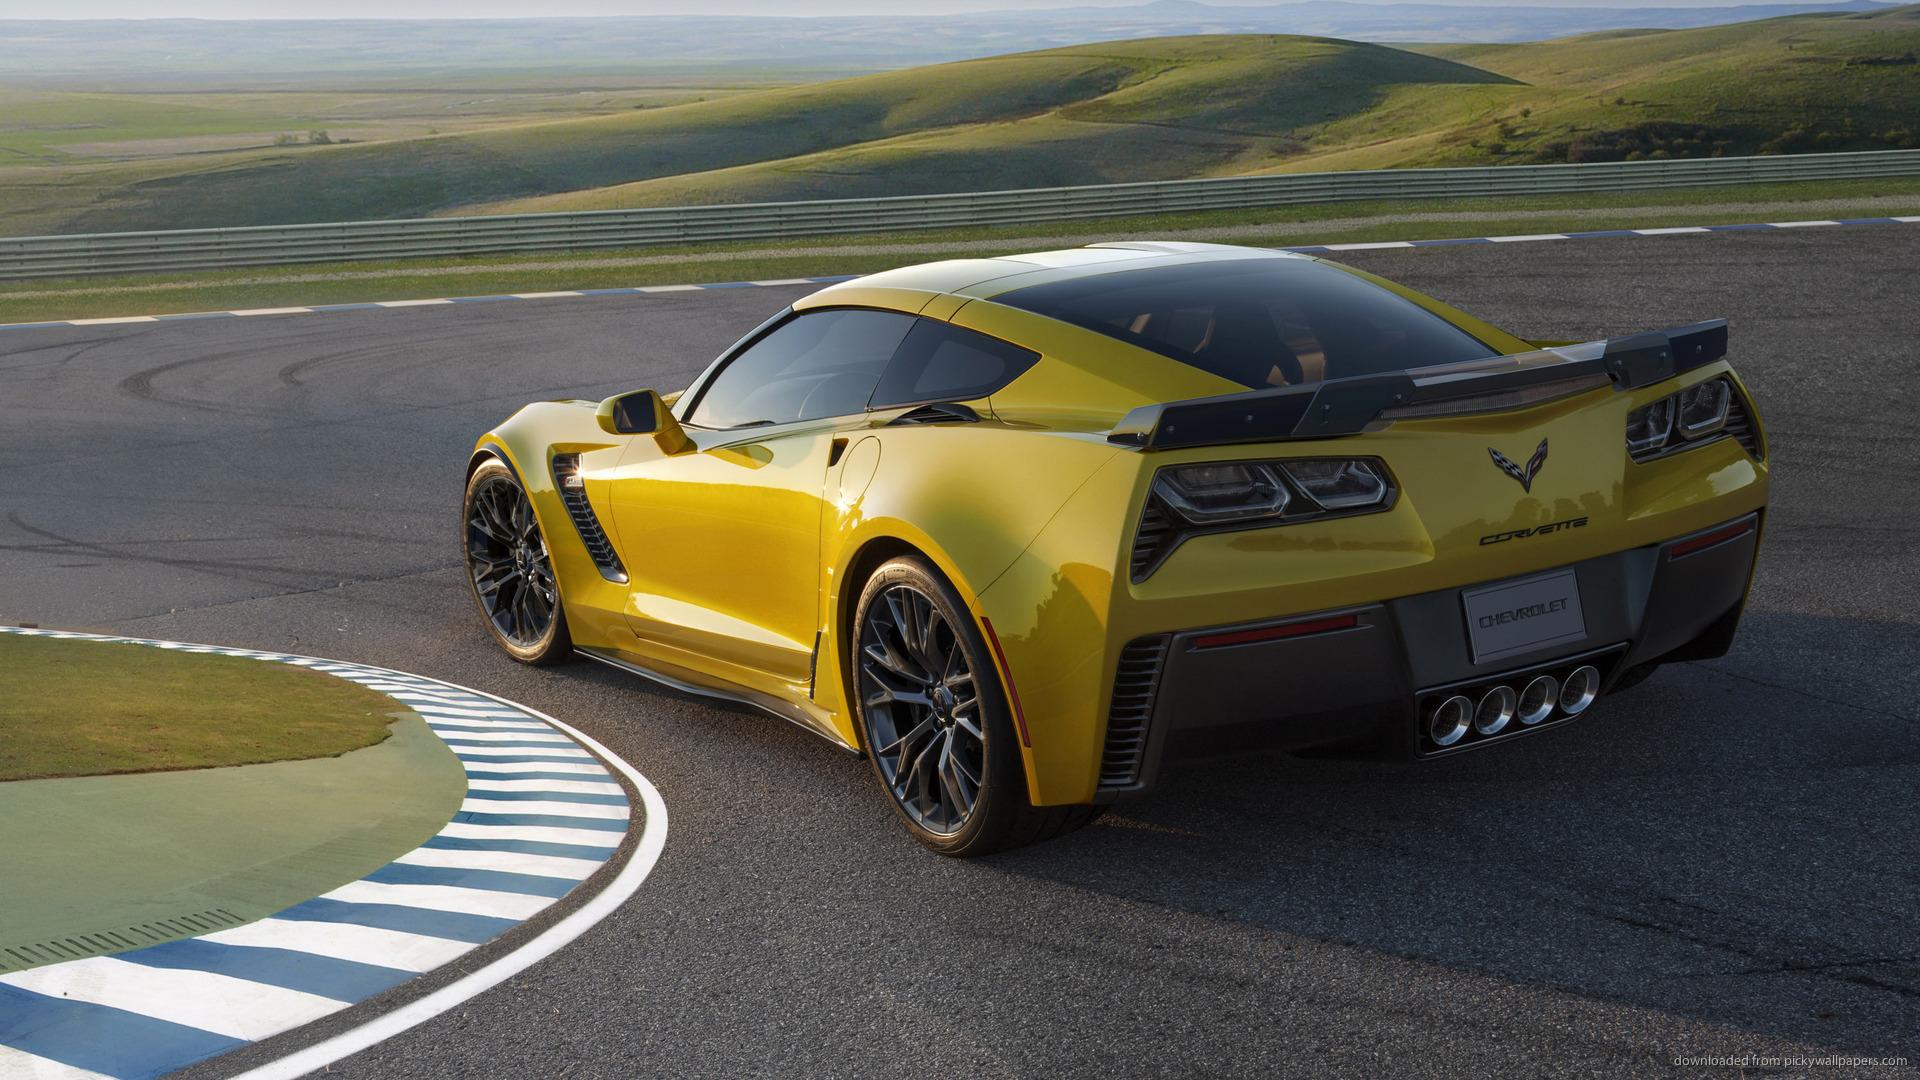 2015 Chevrolet Corvette Z06 Back Picture For iPhone, Blackberry, iPad ...